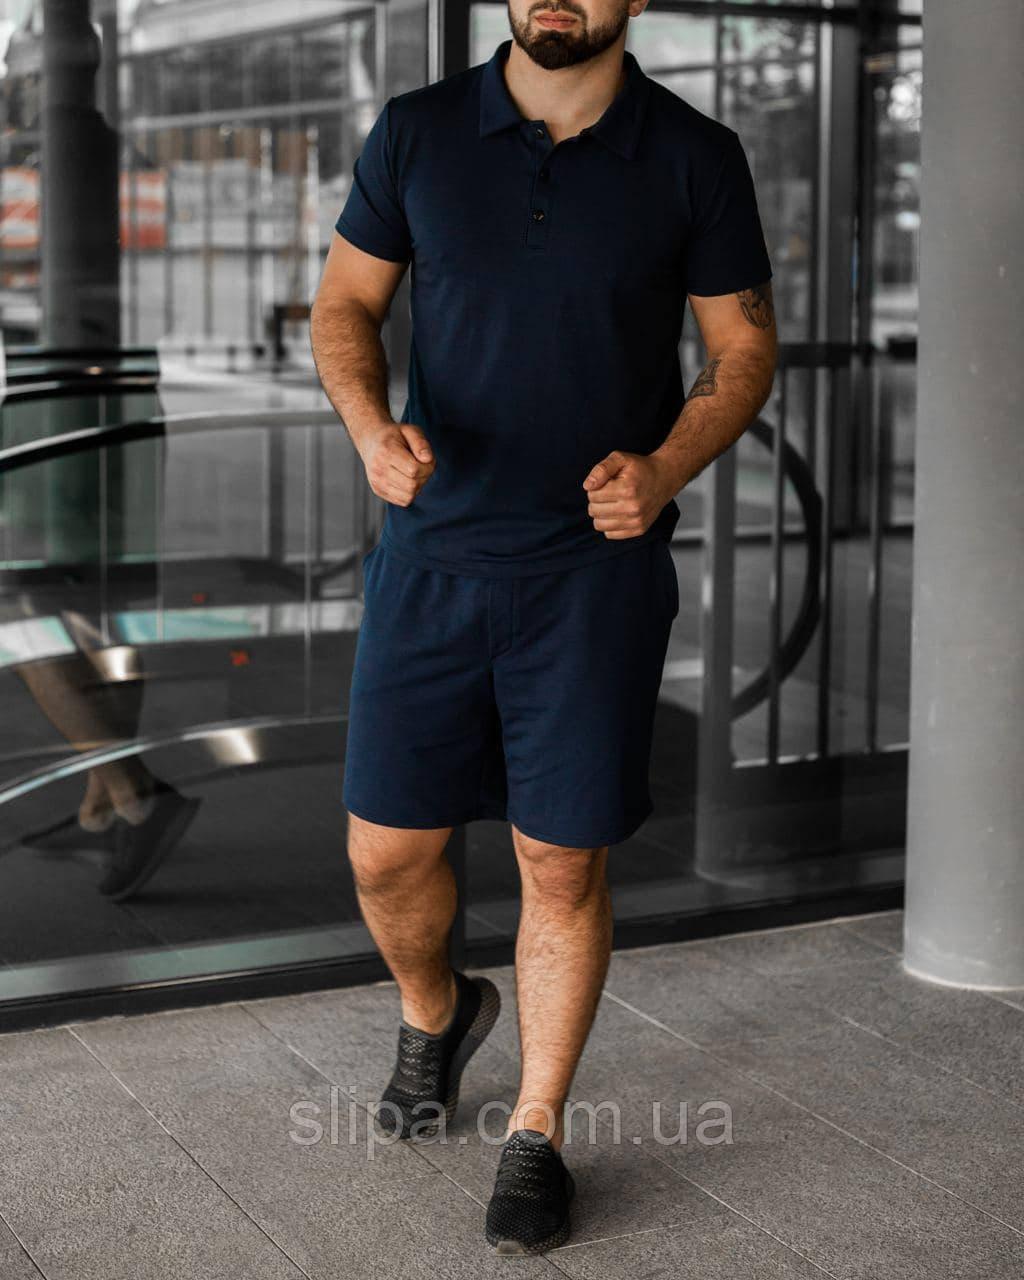 Тёмно-синий летний мужской комплект Polo | поло + шорты